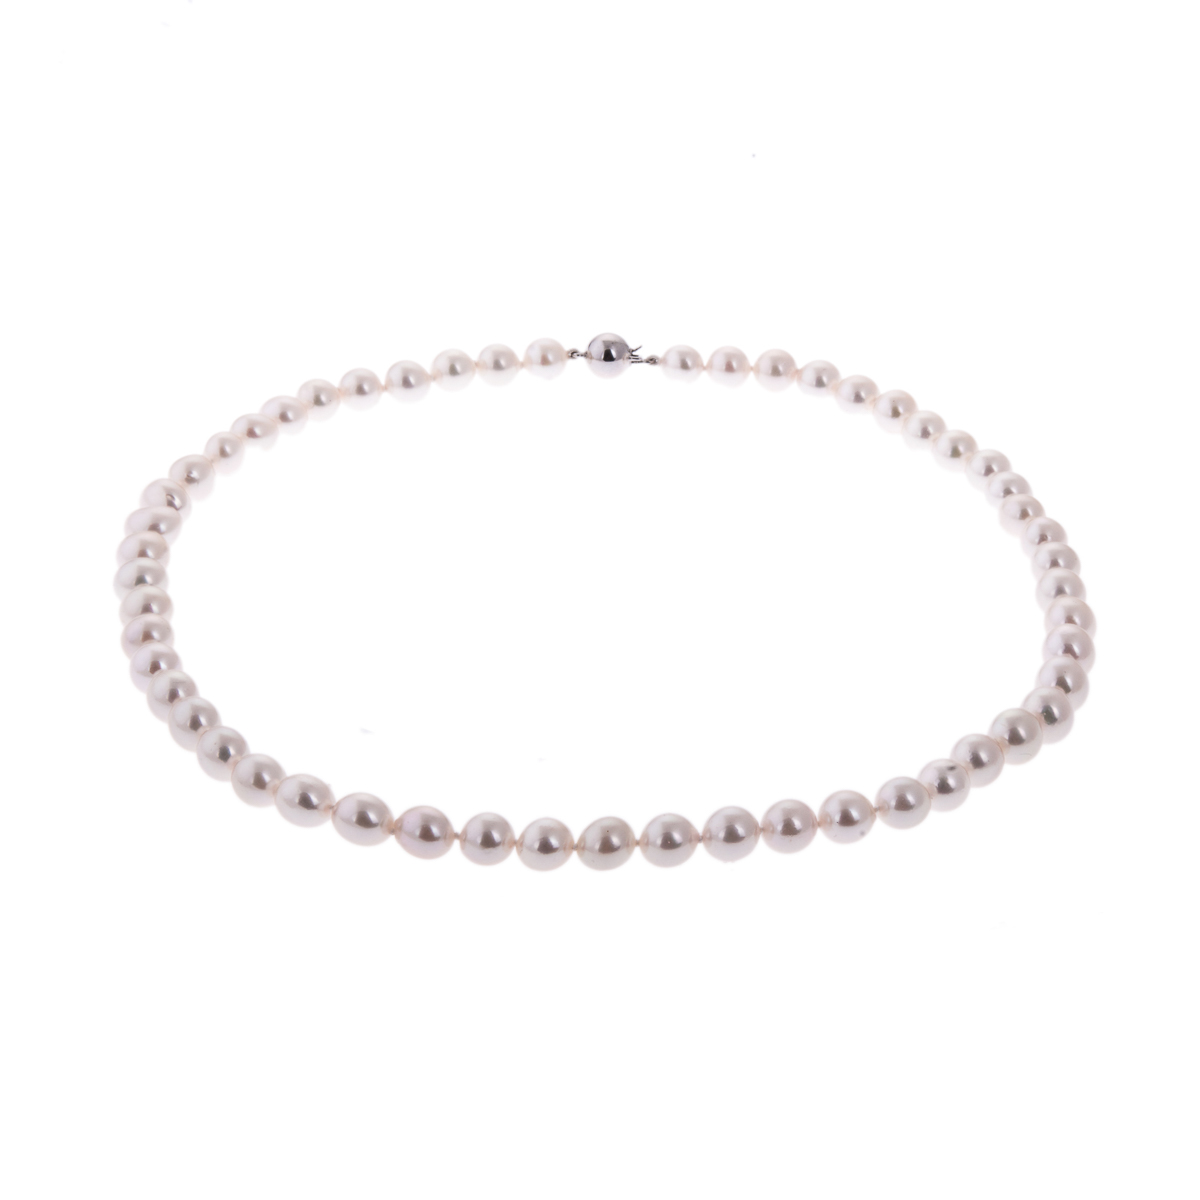 single-strand-7-8.5mm-cultured-pearl-necklet